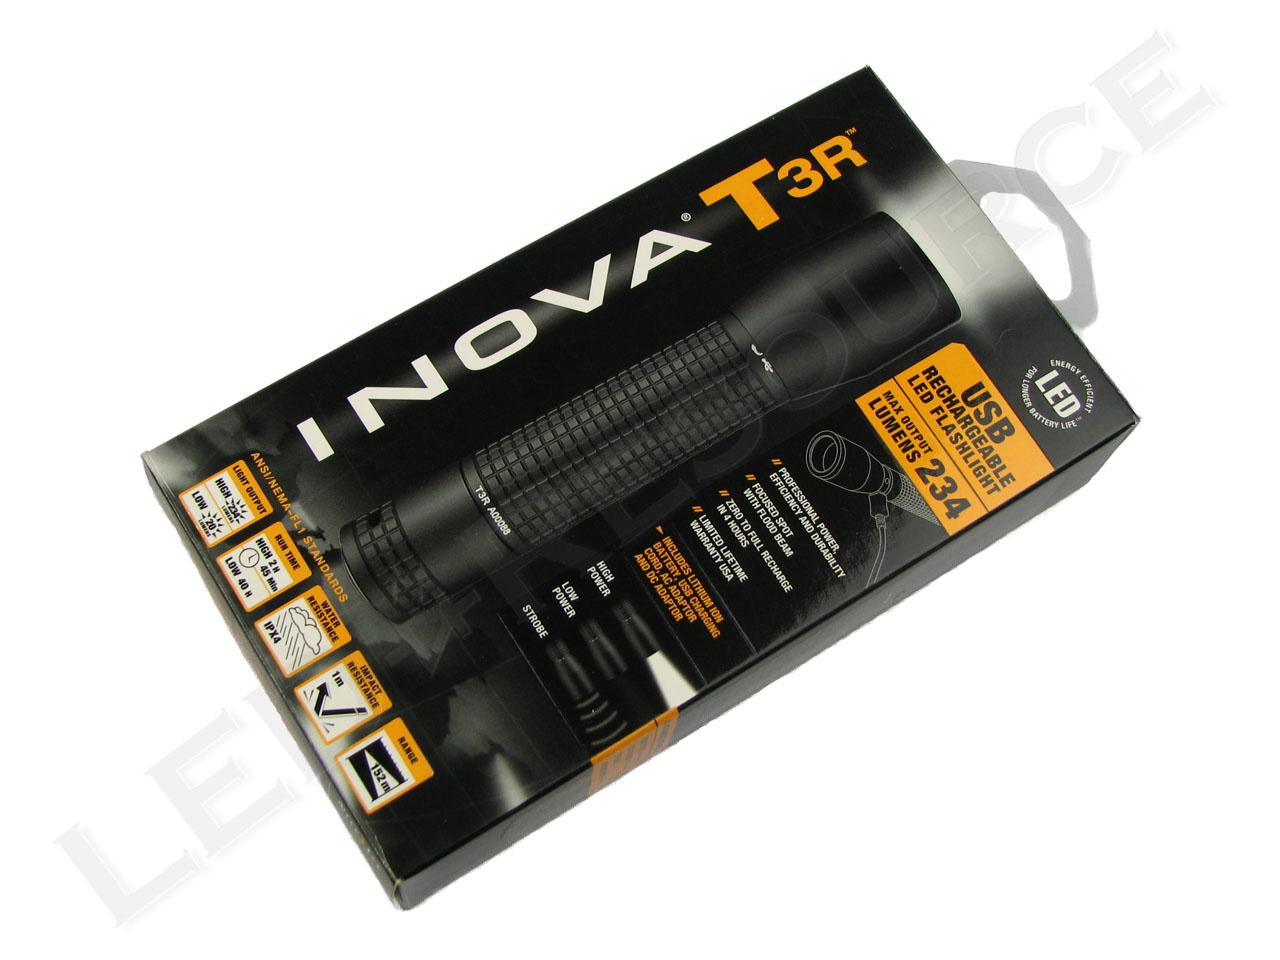 Inova T3R Review